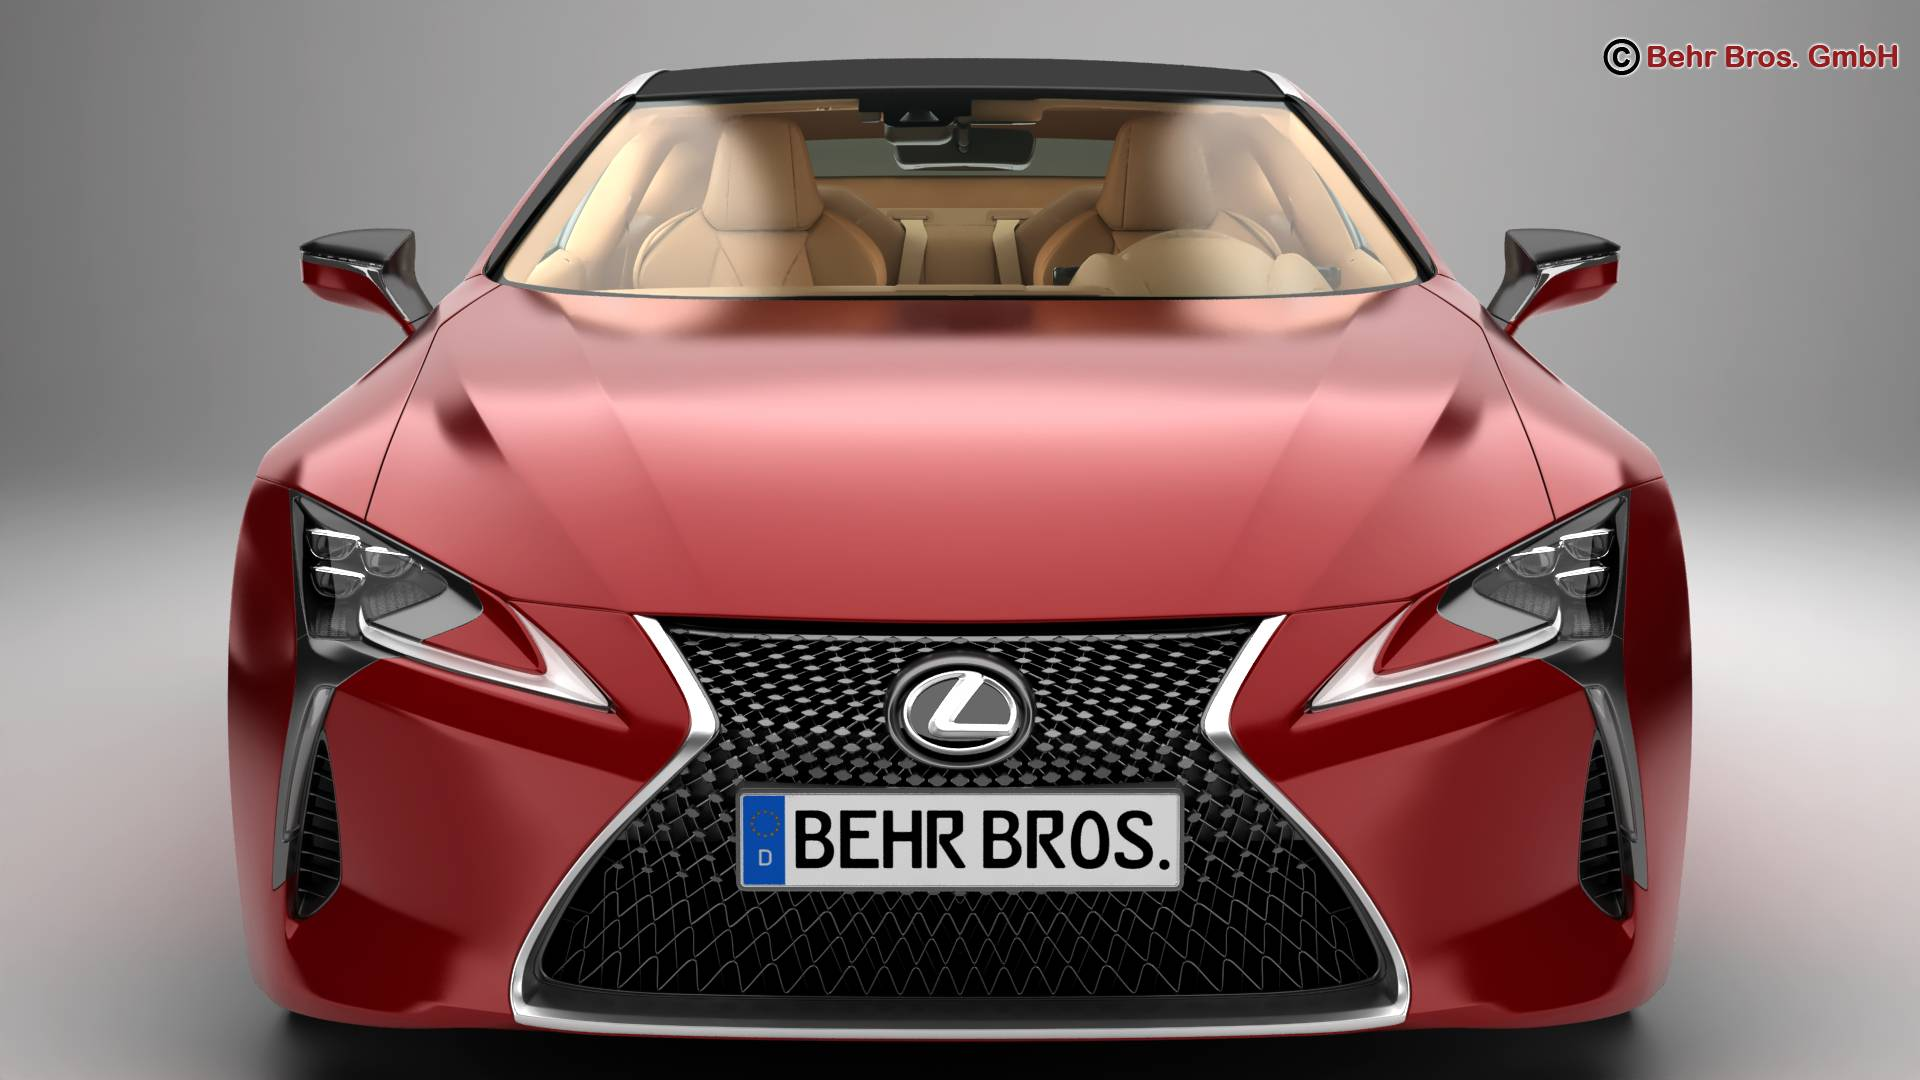 lexus lc 500 eu hybrid 2018 3d model 3ds max fbx c4d lwo ma mb obj 267481